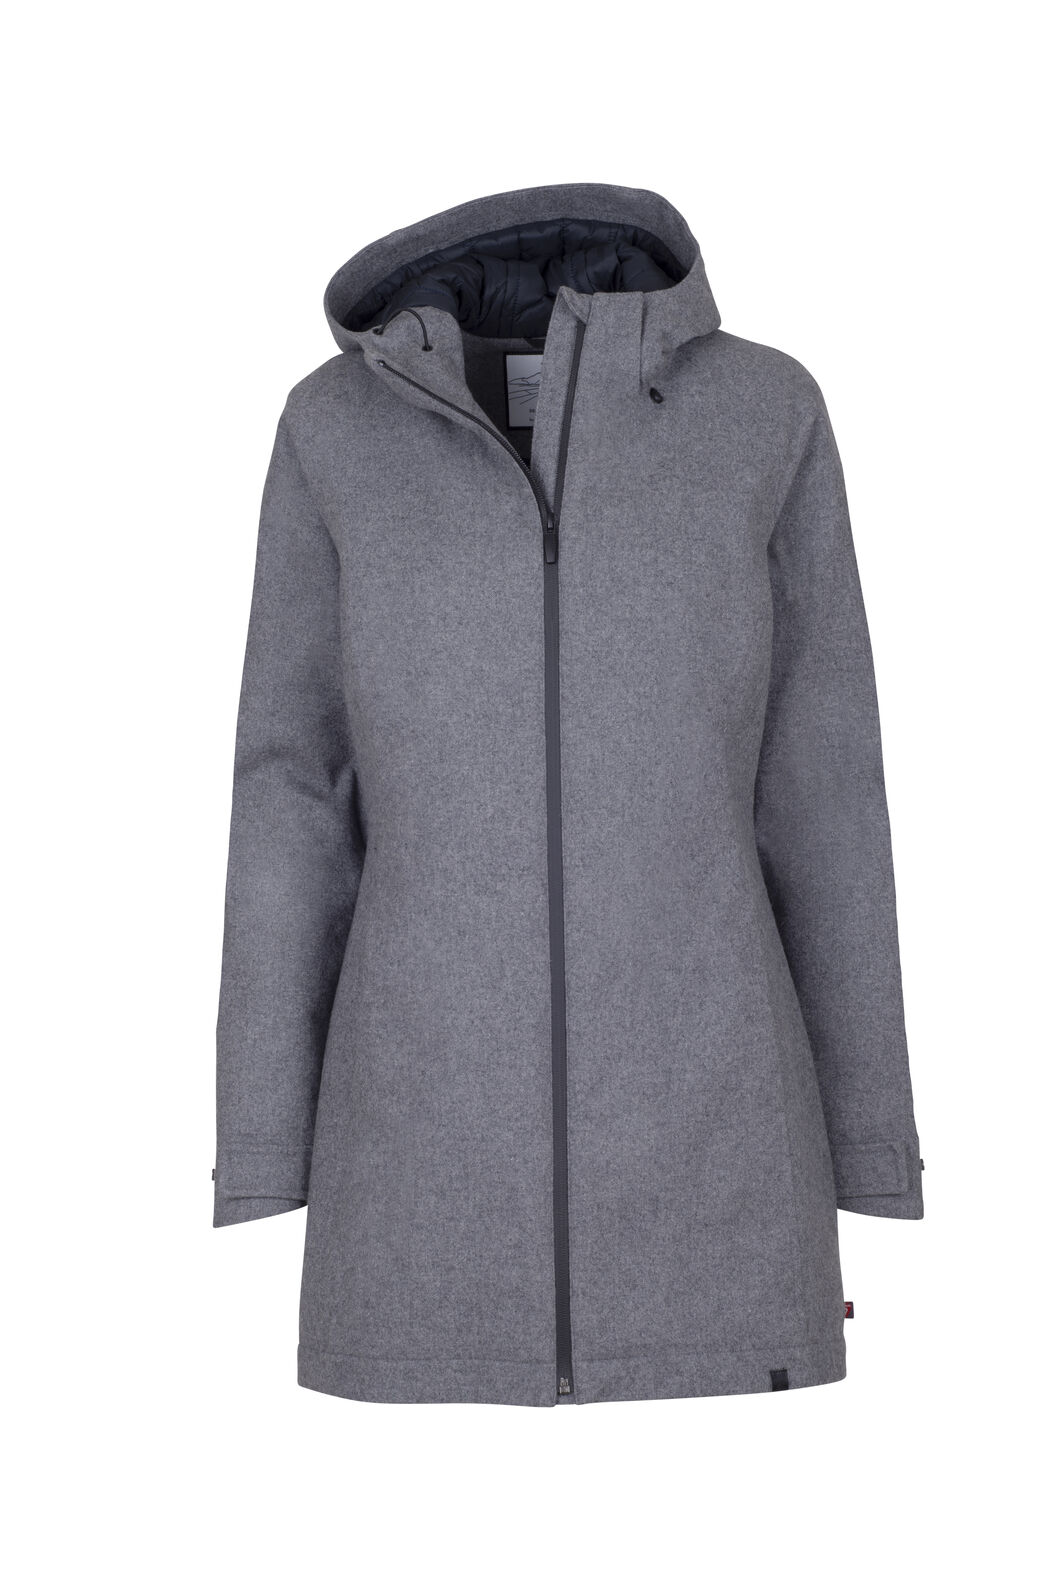 Macpac Barometer PrimaLoft® Wool Coat - Women's, Light Grey Melange, hi-res